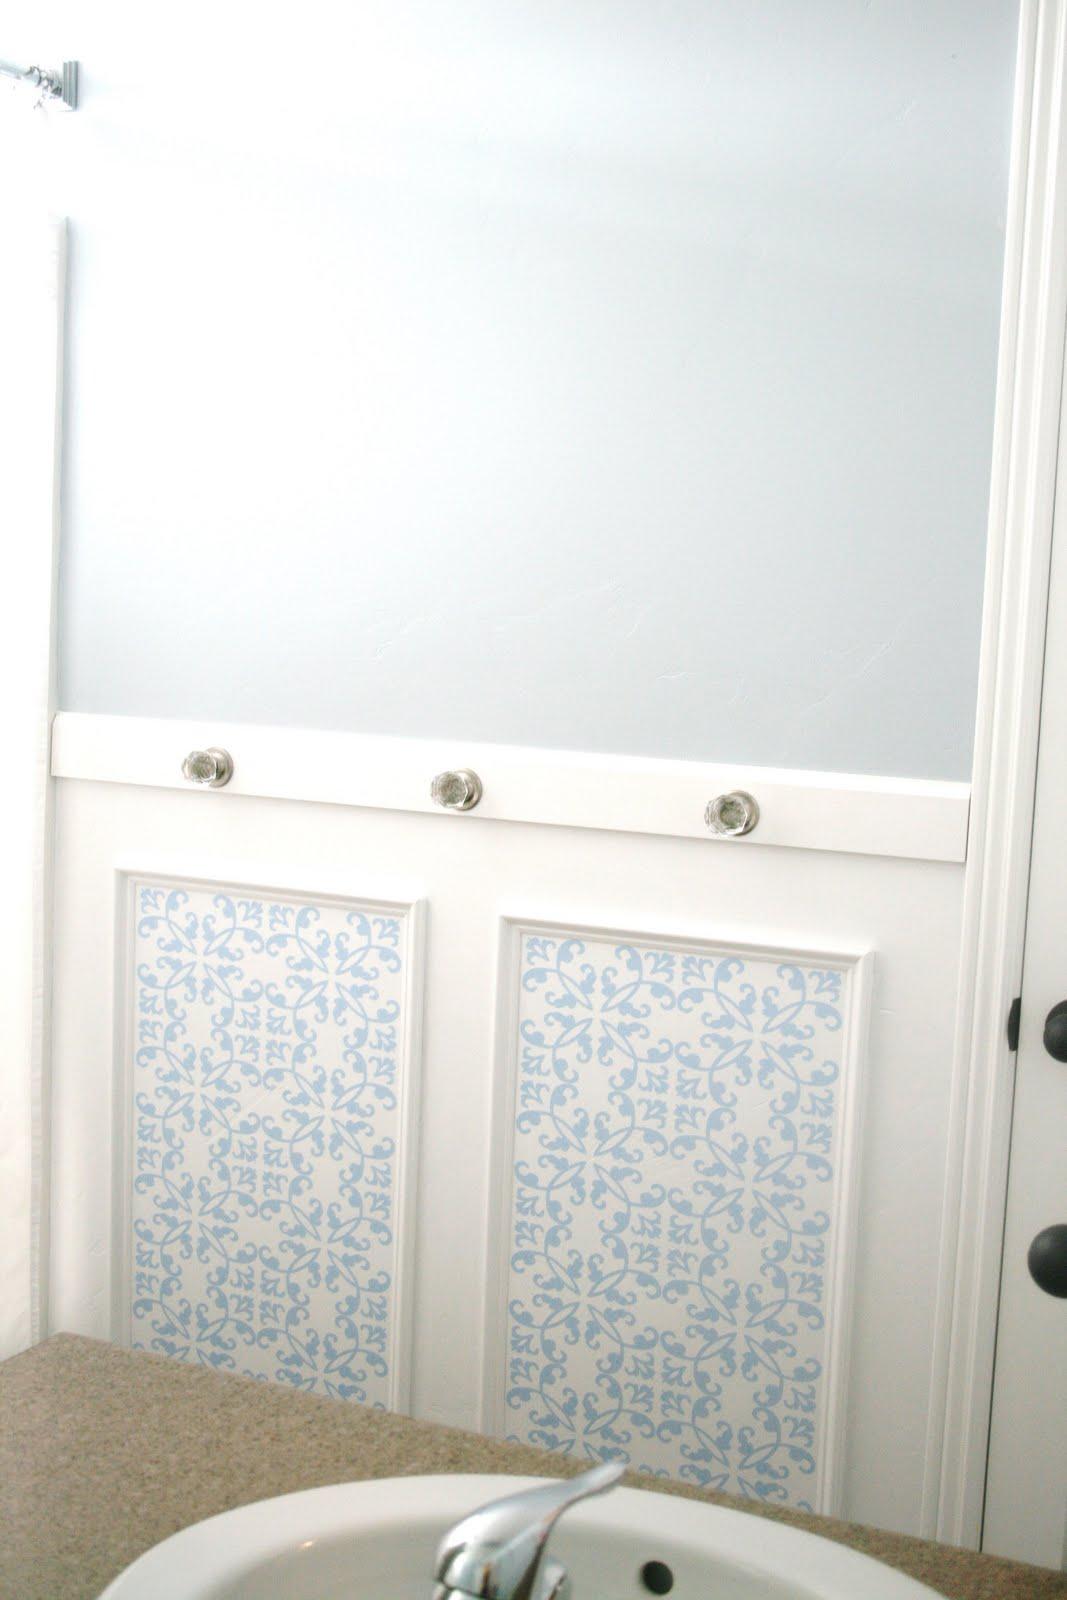 Bathroom Wall Mirrors Large: Chic Bathroom Wall Treatment Tutorial